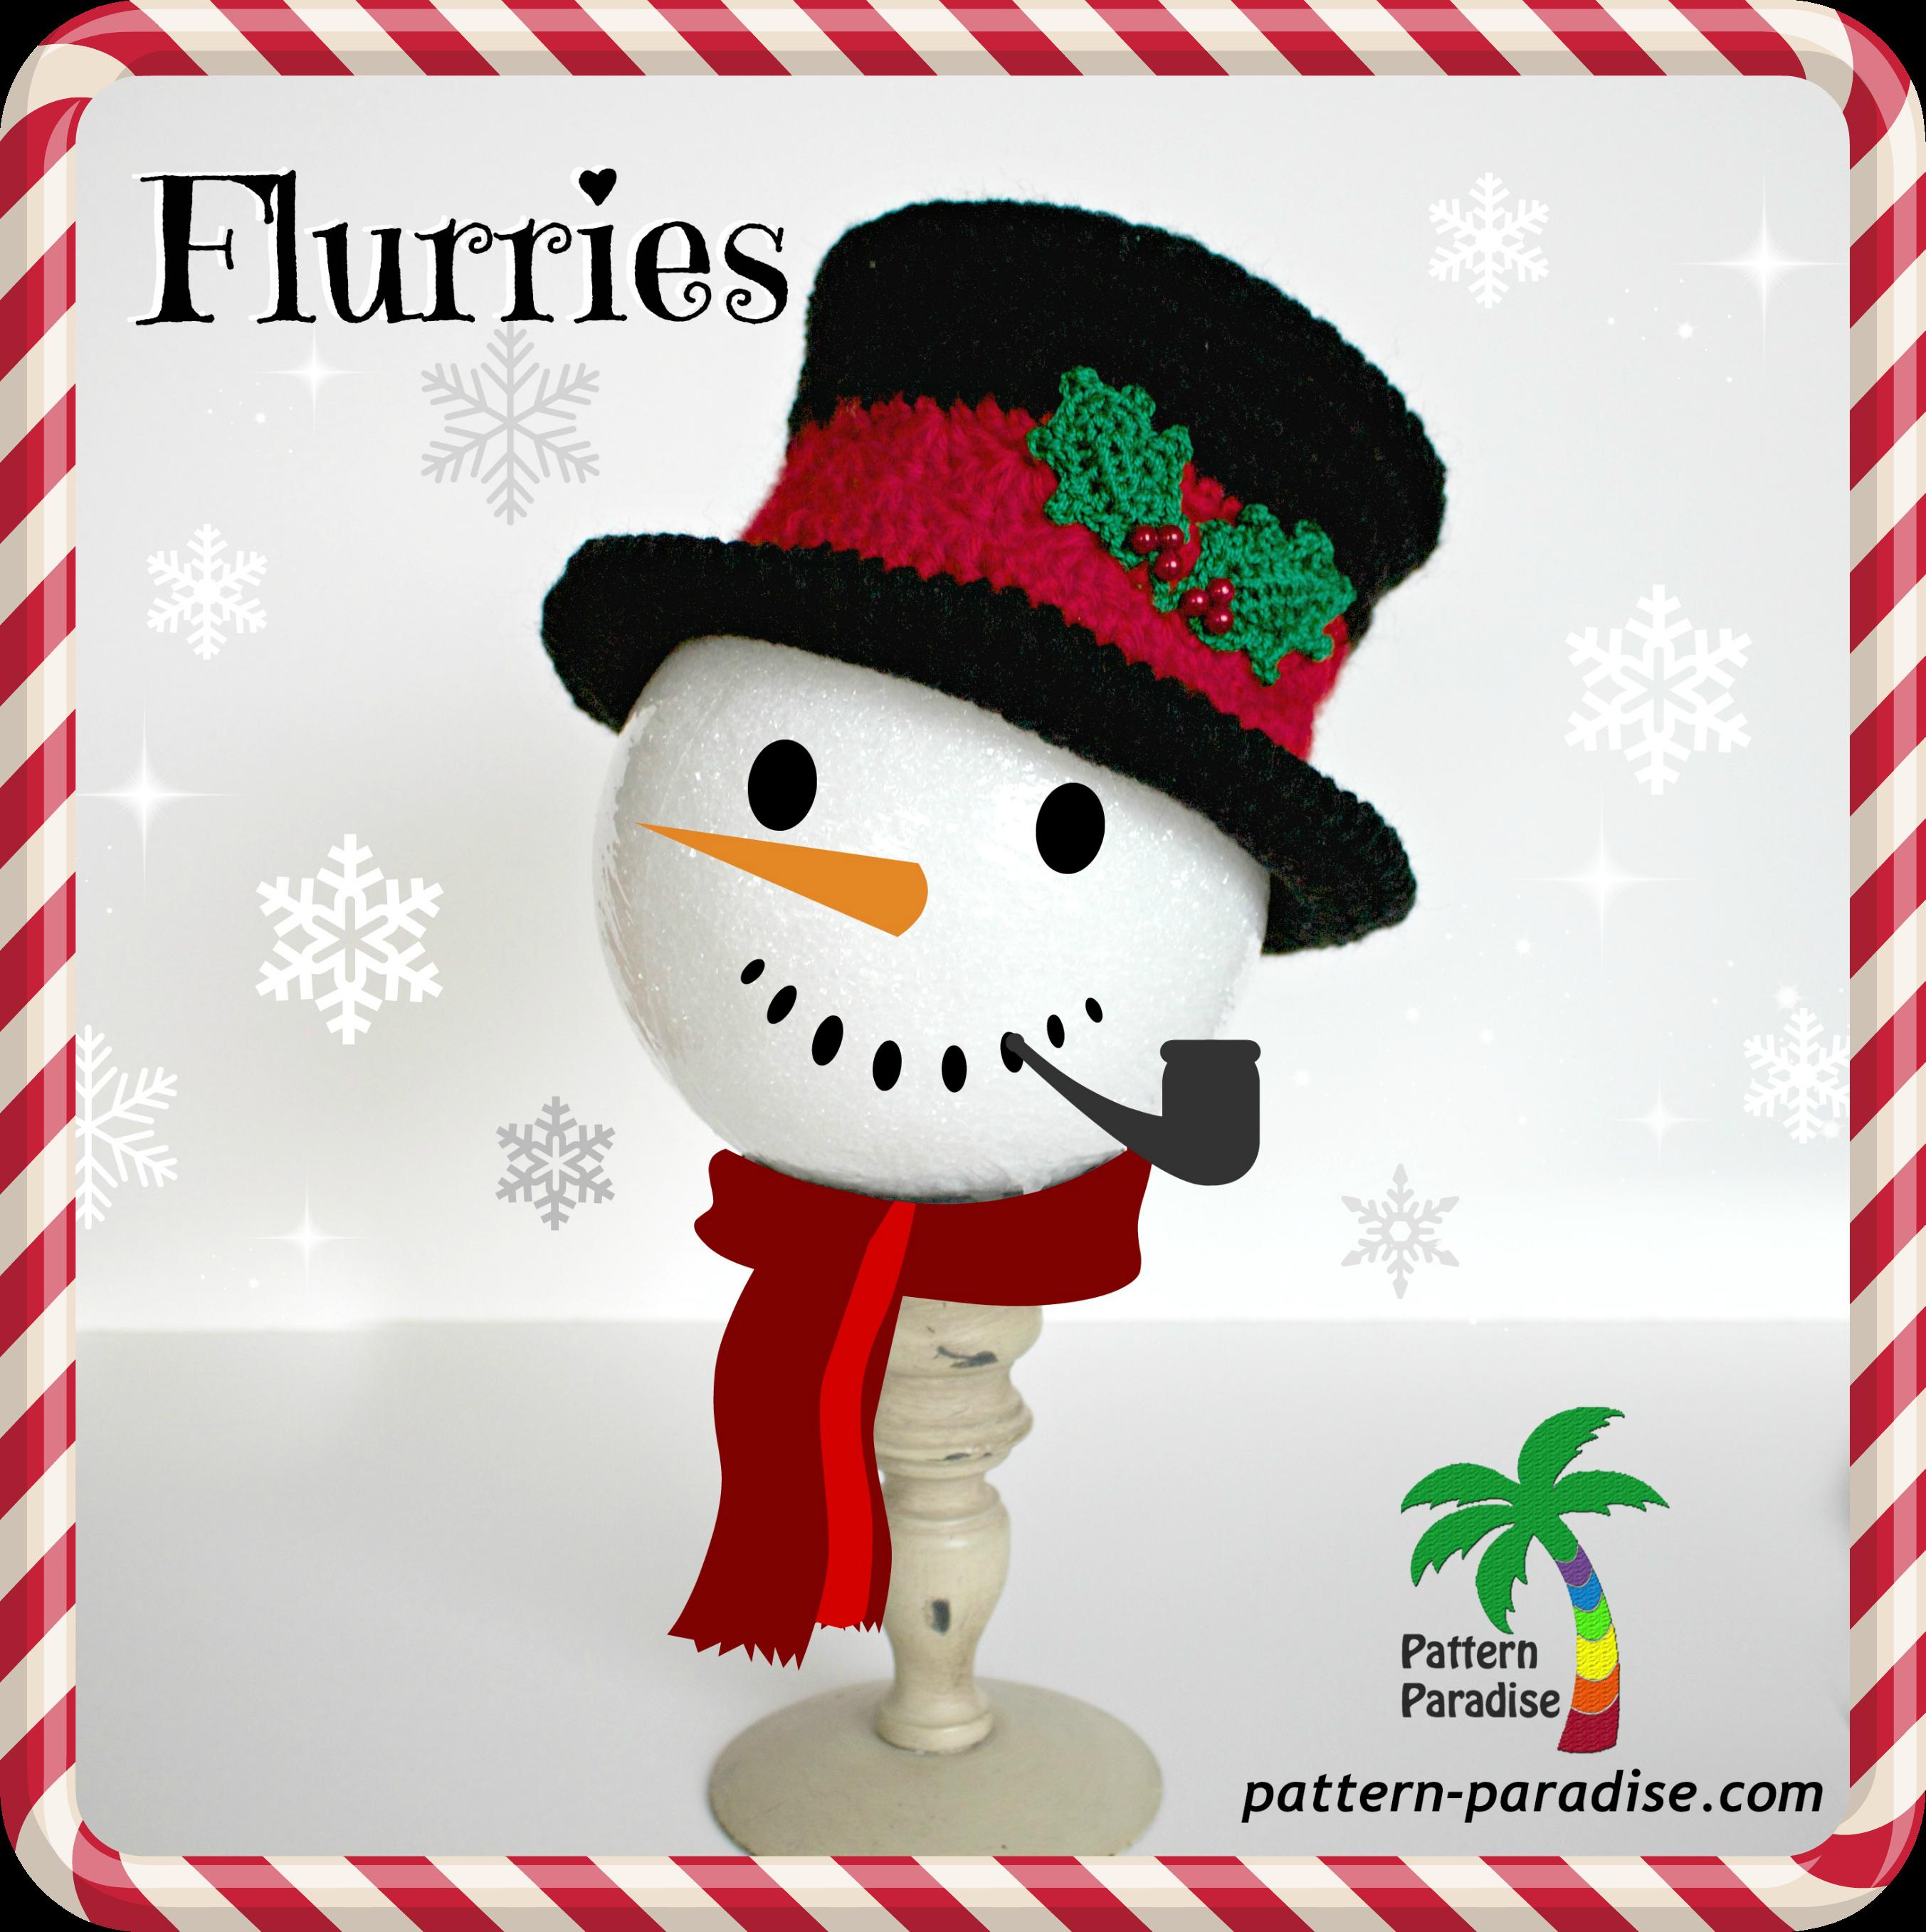 Flurries ~ Pattern Paradise